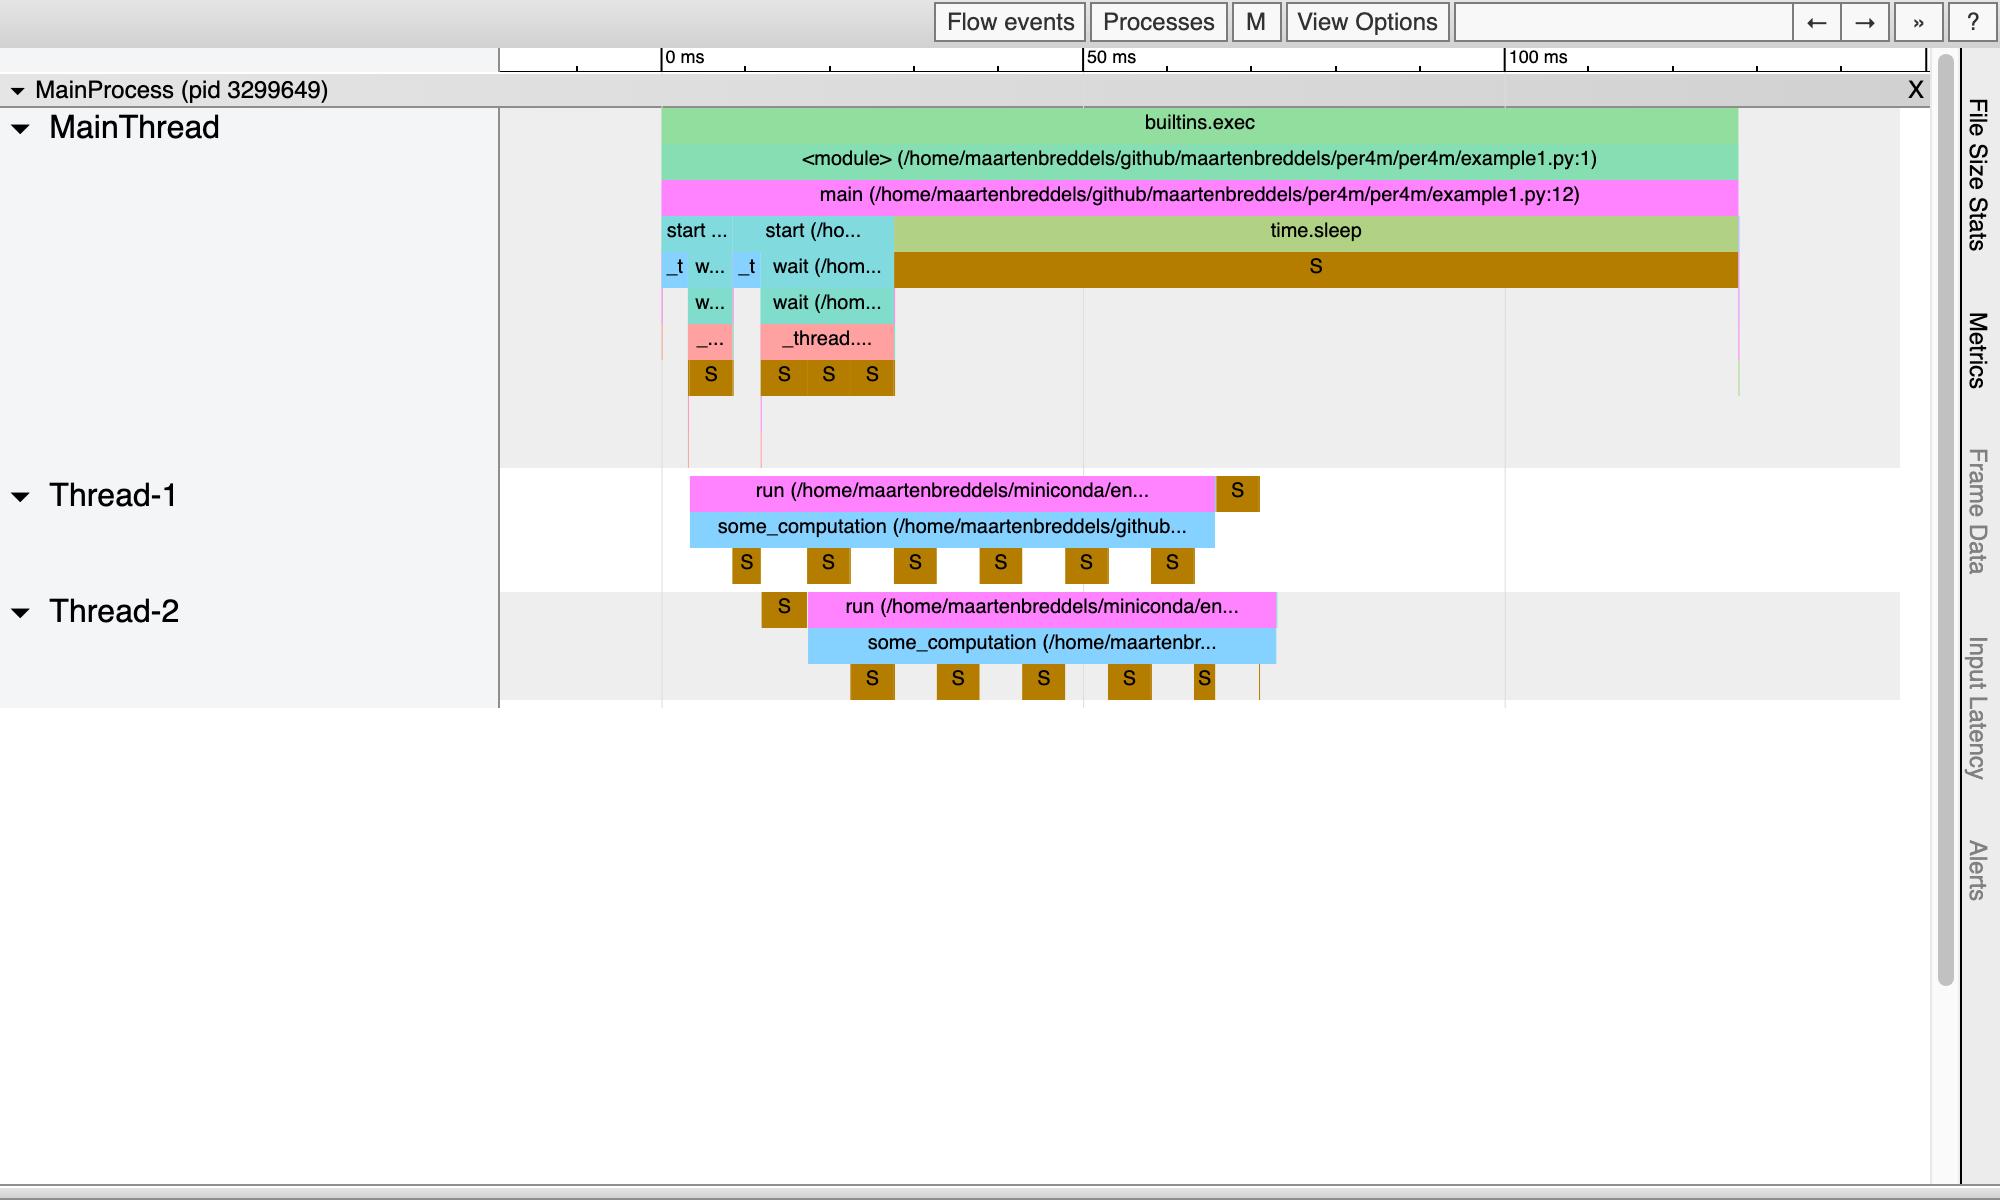 umair-akbar-example1 state - Tracing the Python GIL (Global Interpreter Lock)